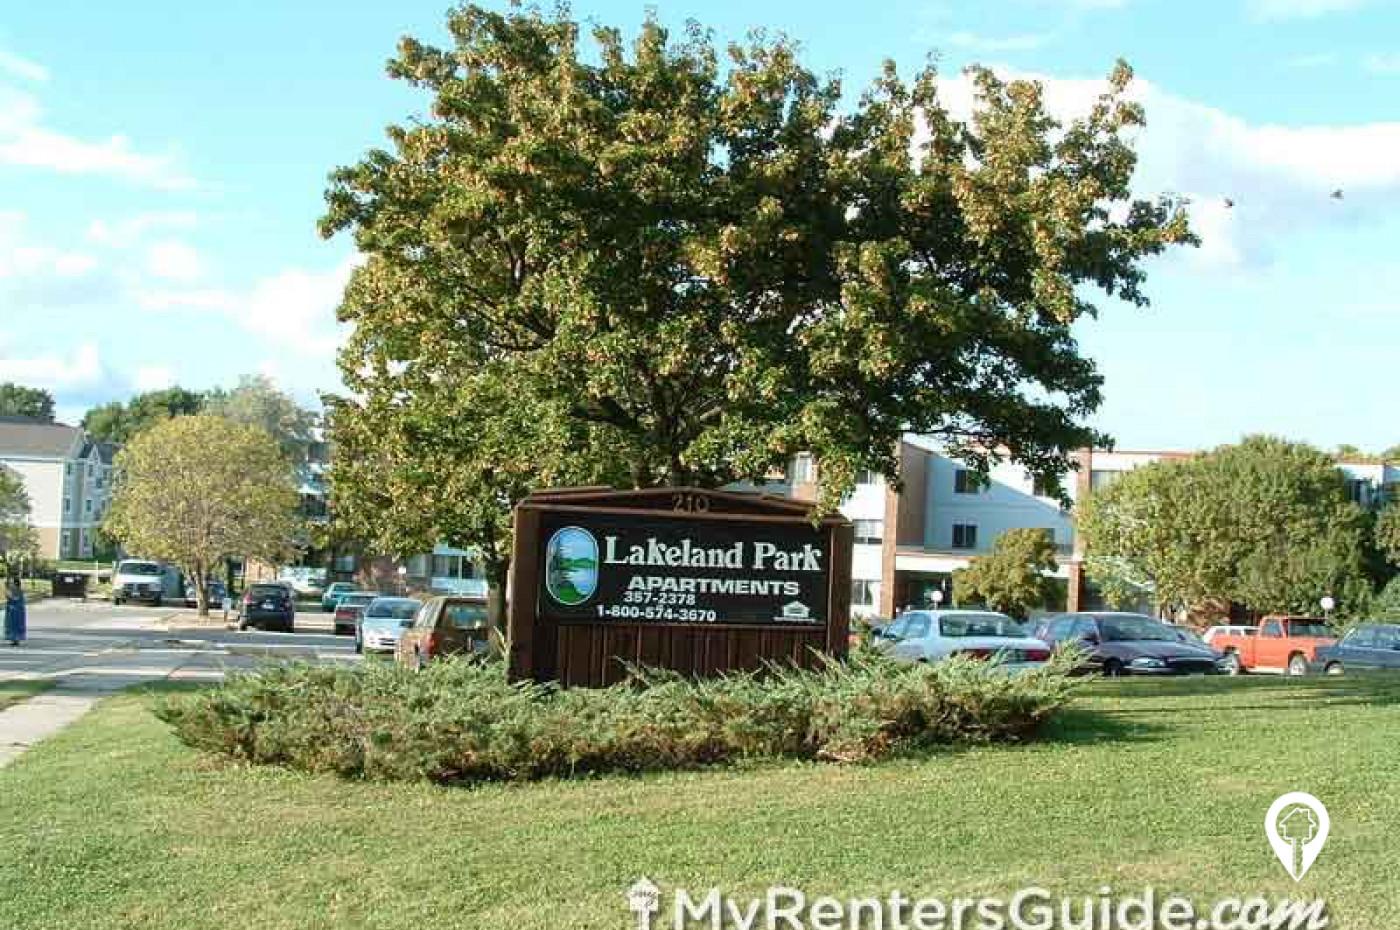 Lakeland Park Apartments